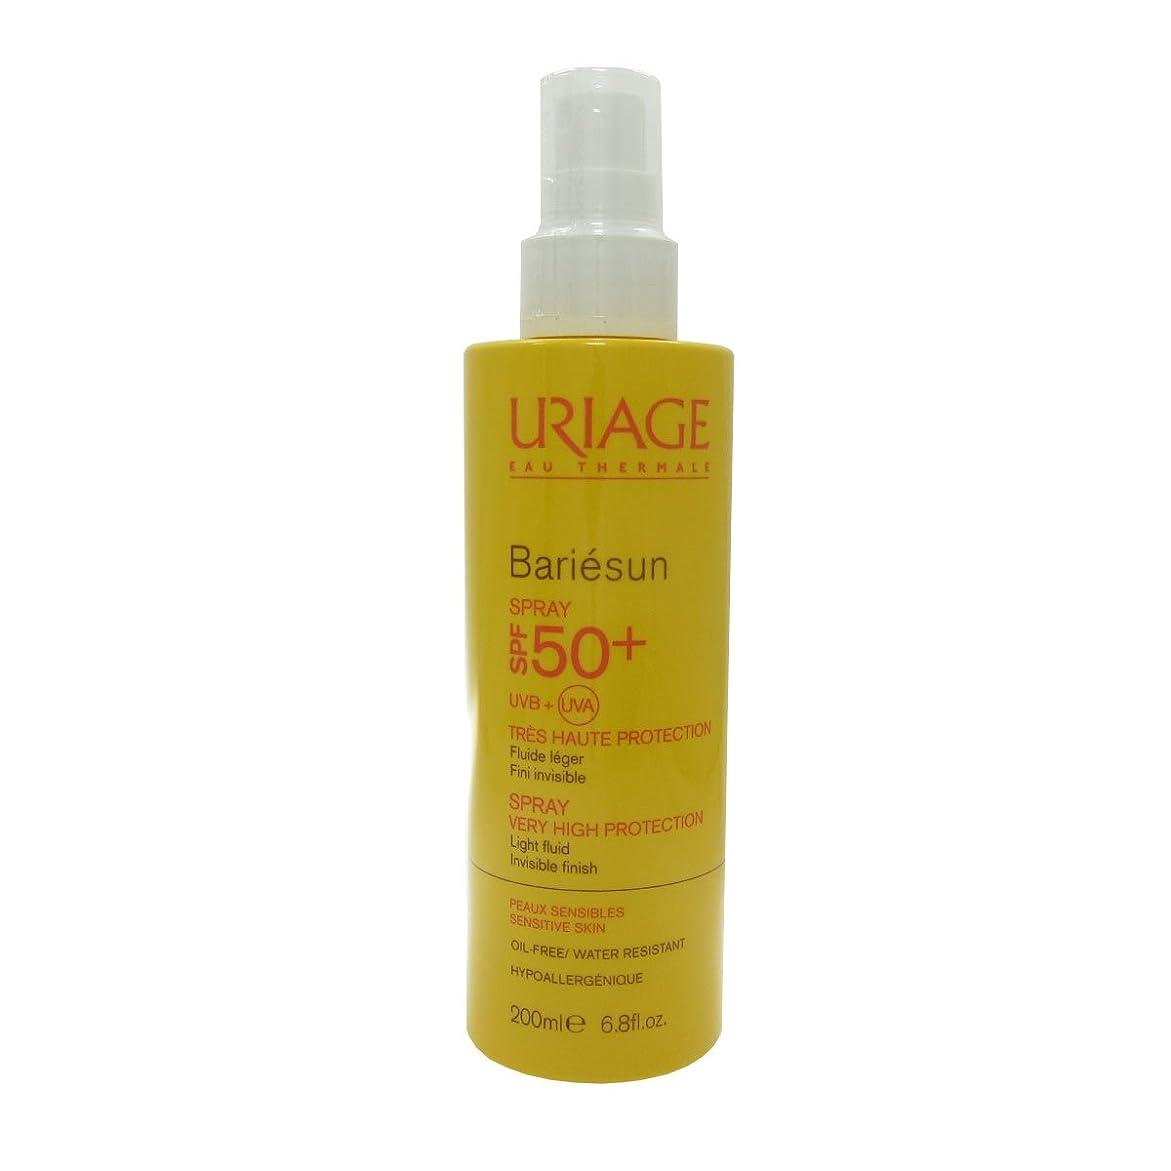 変更可能アベニュー王女Uriage Bariesun Spray Spf 50+ 200ml [並行輸入品]